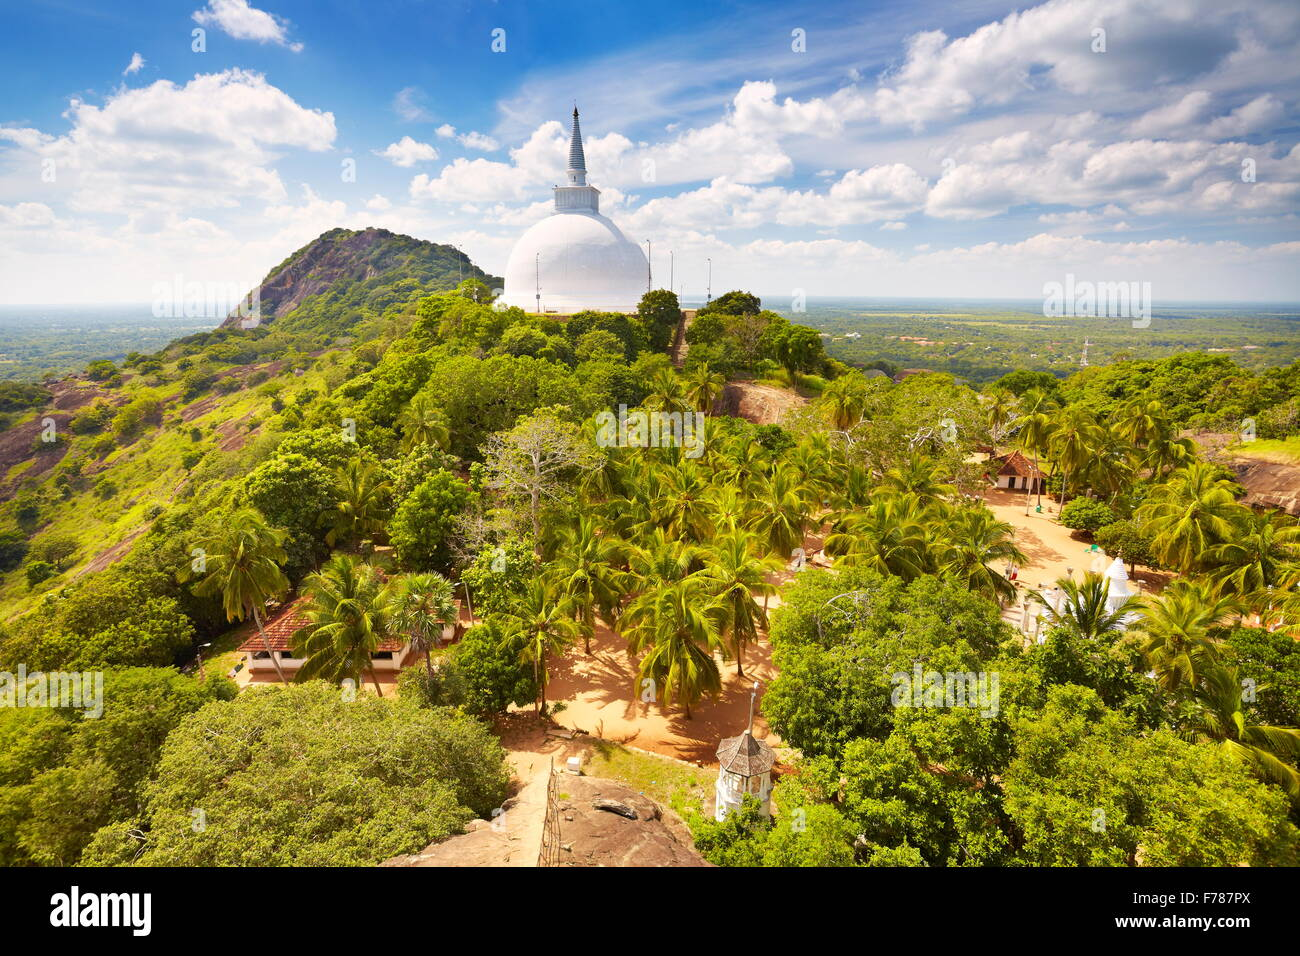 Sri Lanka - Mihintale Temple, view at Mahaseya Dagoba stupa, UNESCO World Heritage Site Stock Photo